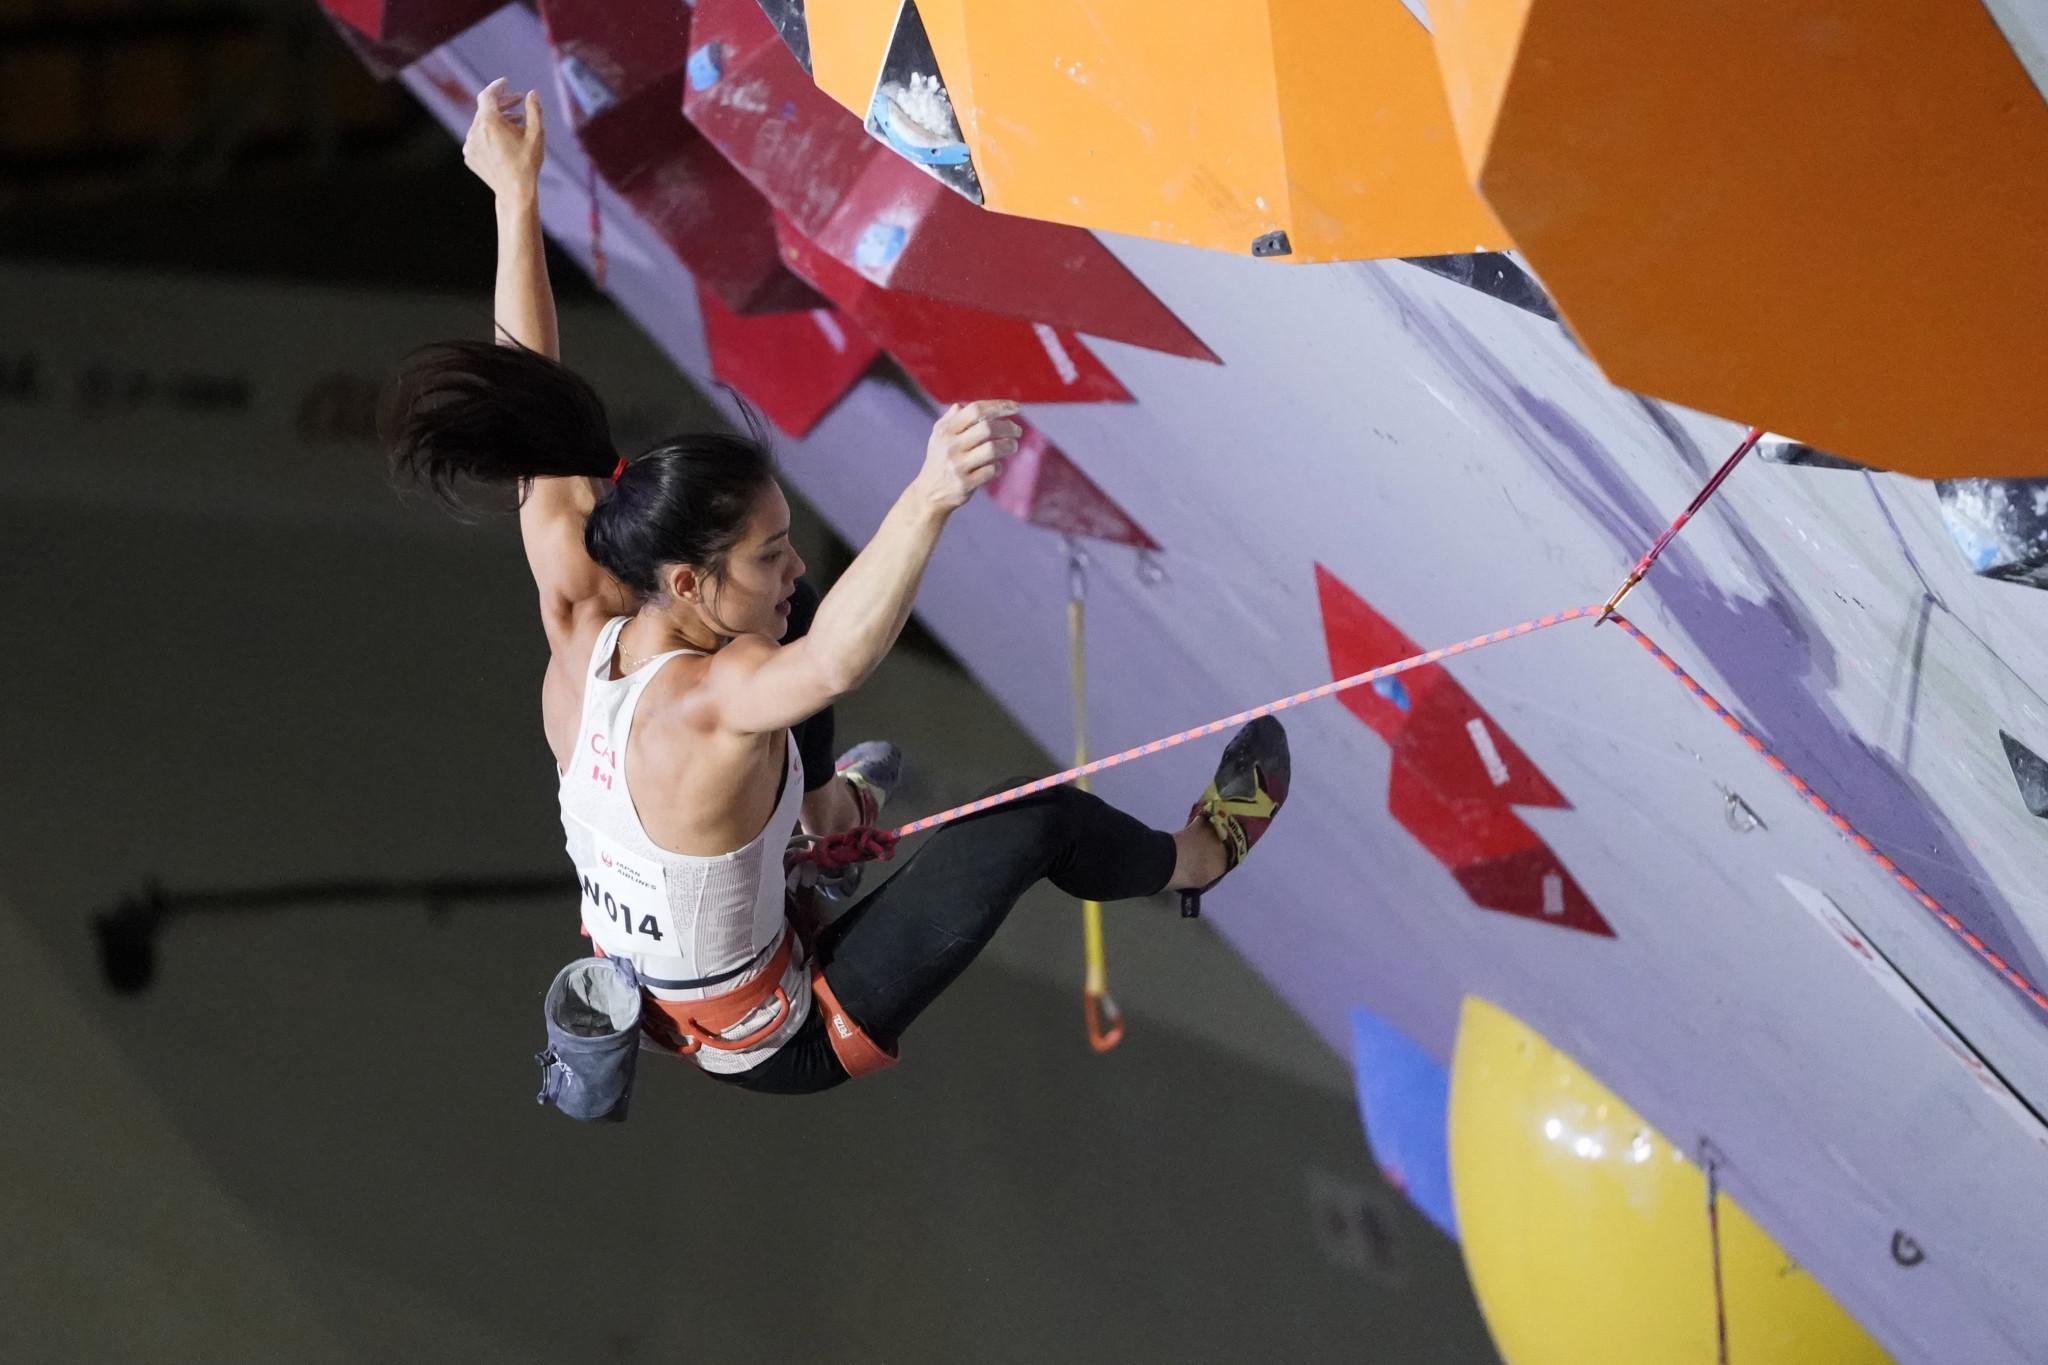 Athletes chasing Tokyo 2020 places at Pan American Sport Climbing Championships